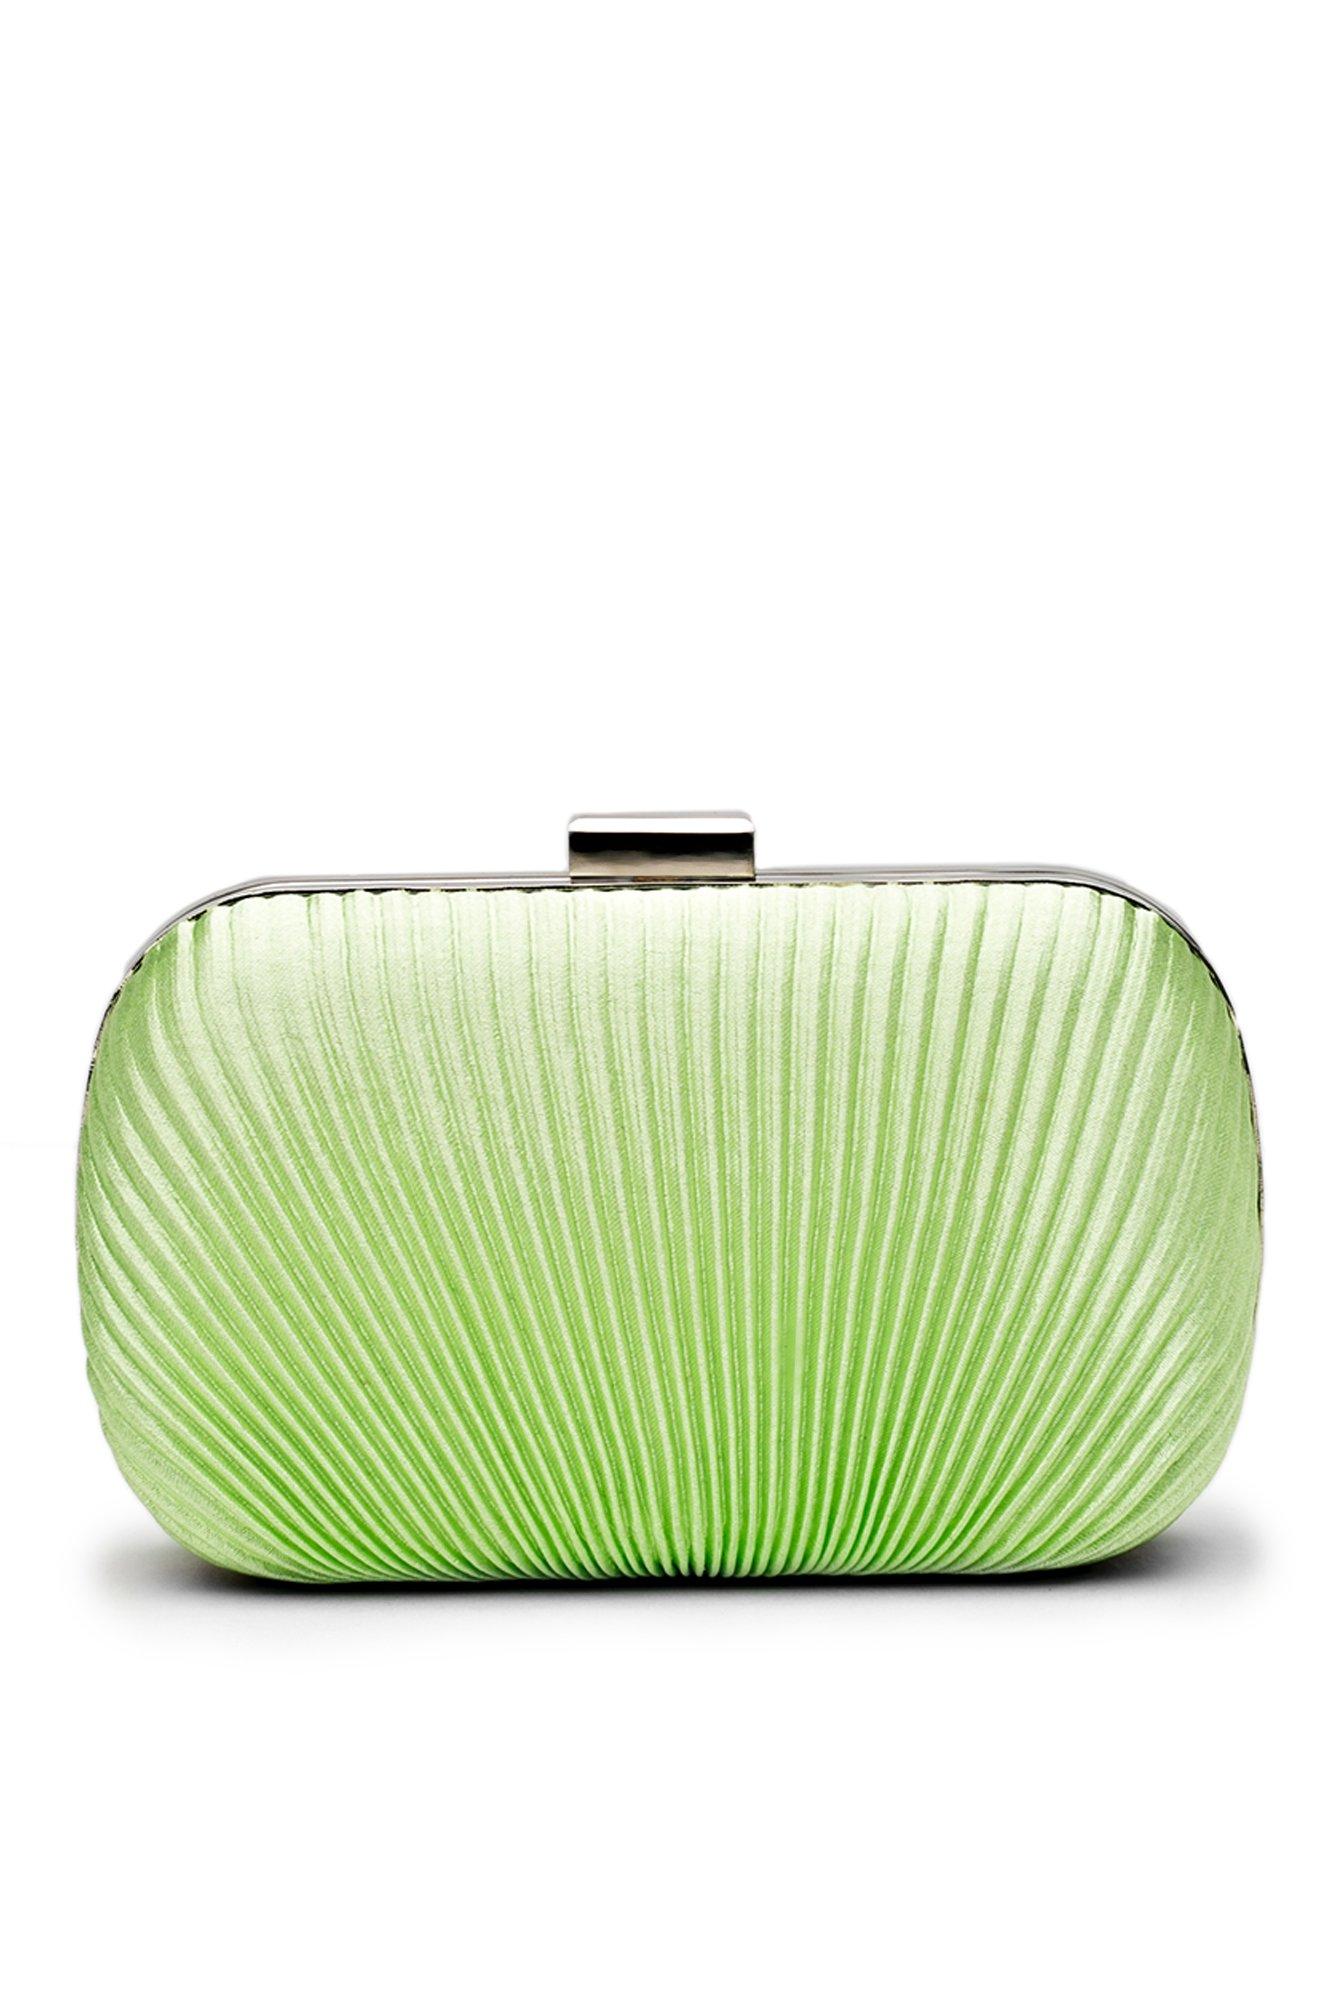 Women Clutch Purse Wallet Hard Case Satin Evening Bag Handbag With Chain Strap (Green)